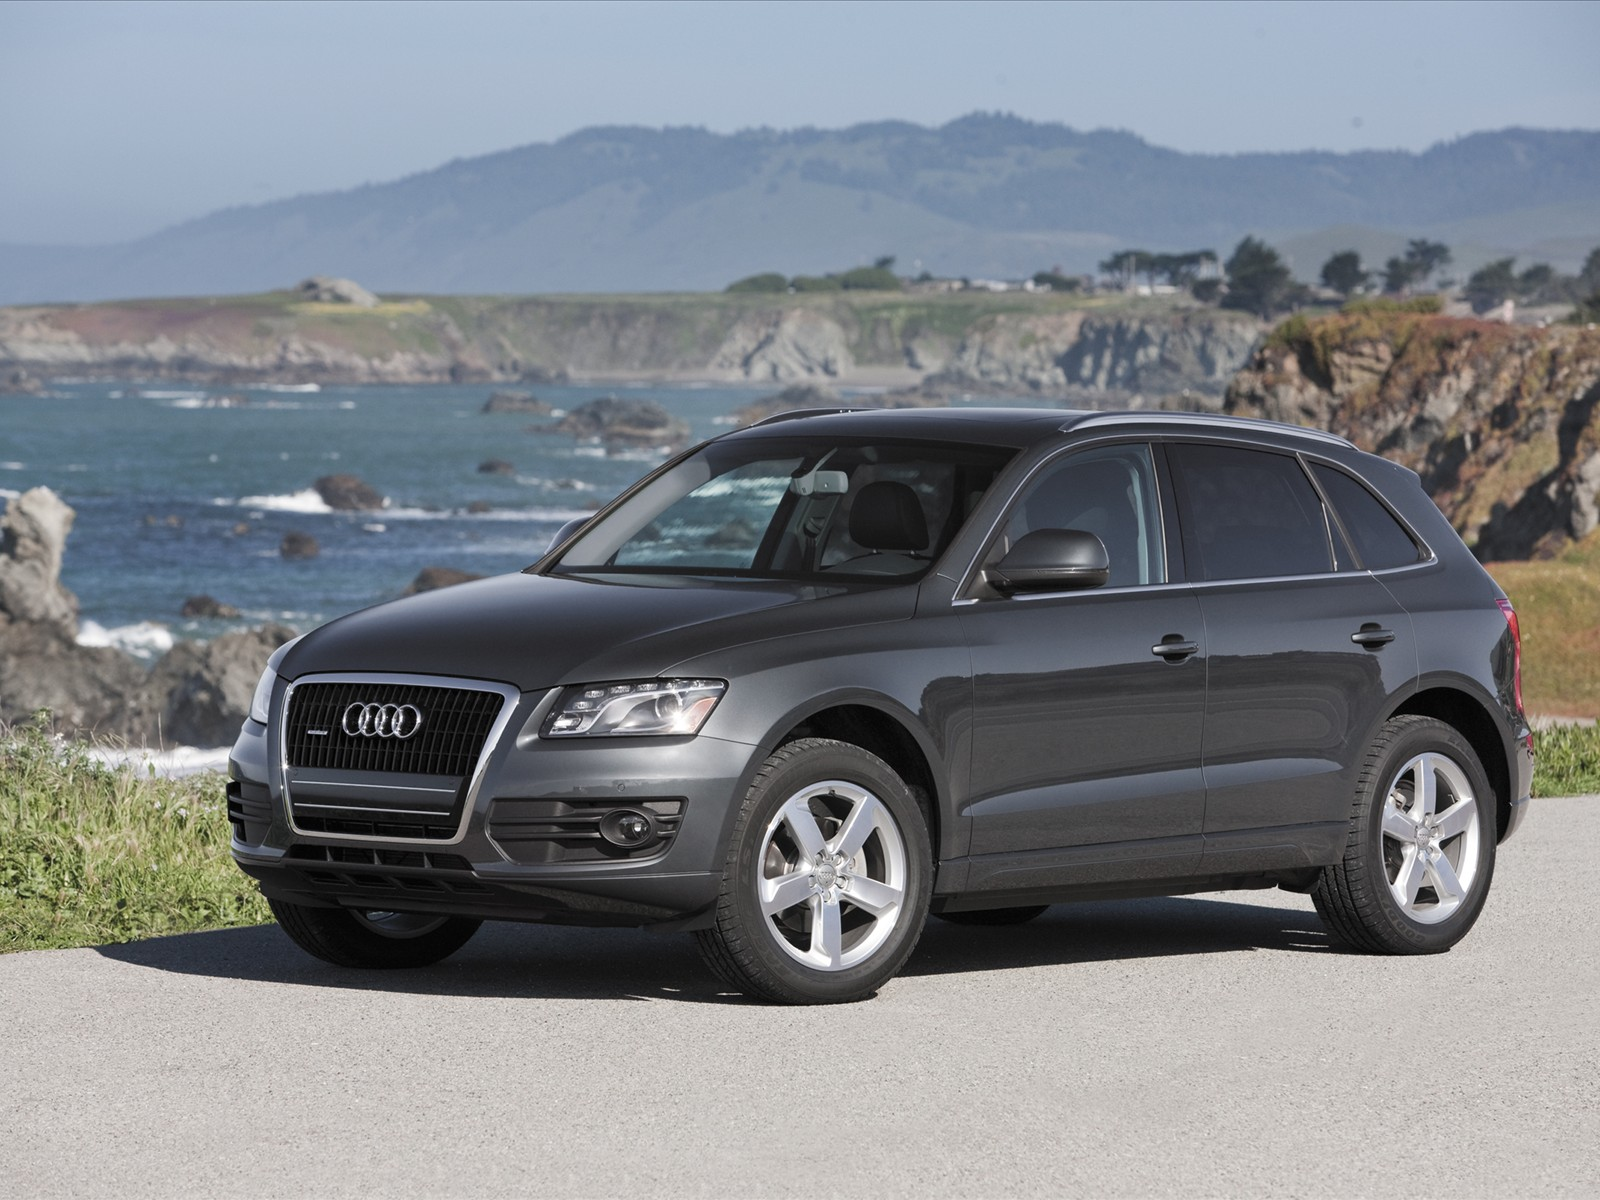 http://3.bp.blogspot.com/_J3_liDBfbvs/S-WIwoGJ11I/AAAAAAAAqro/nvRm8PWs4jo/s1600/2010-Audi-Q5-Luxury-Cars.jpg